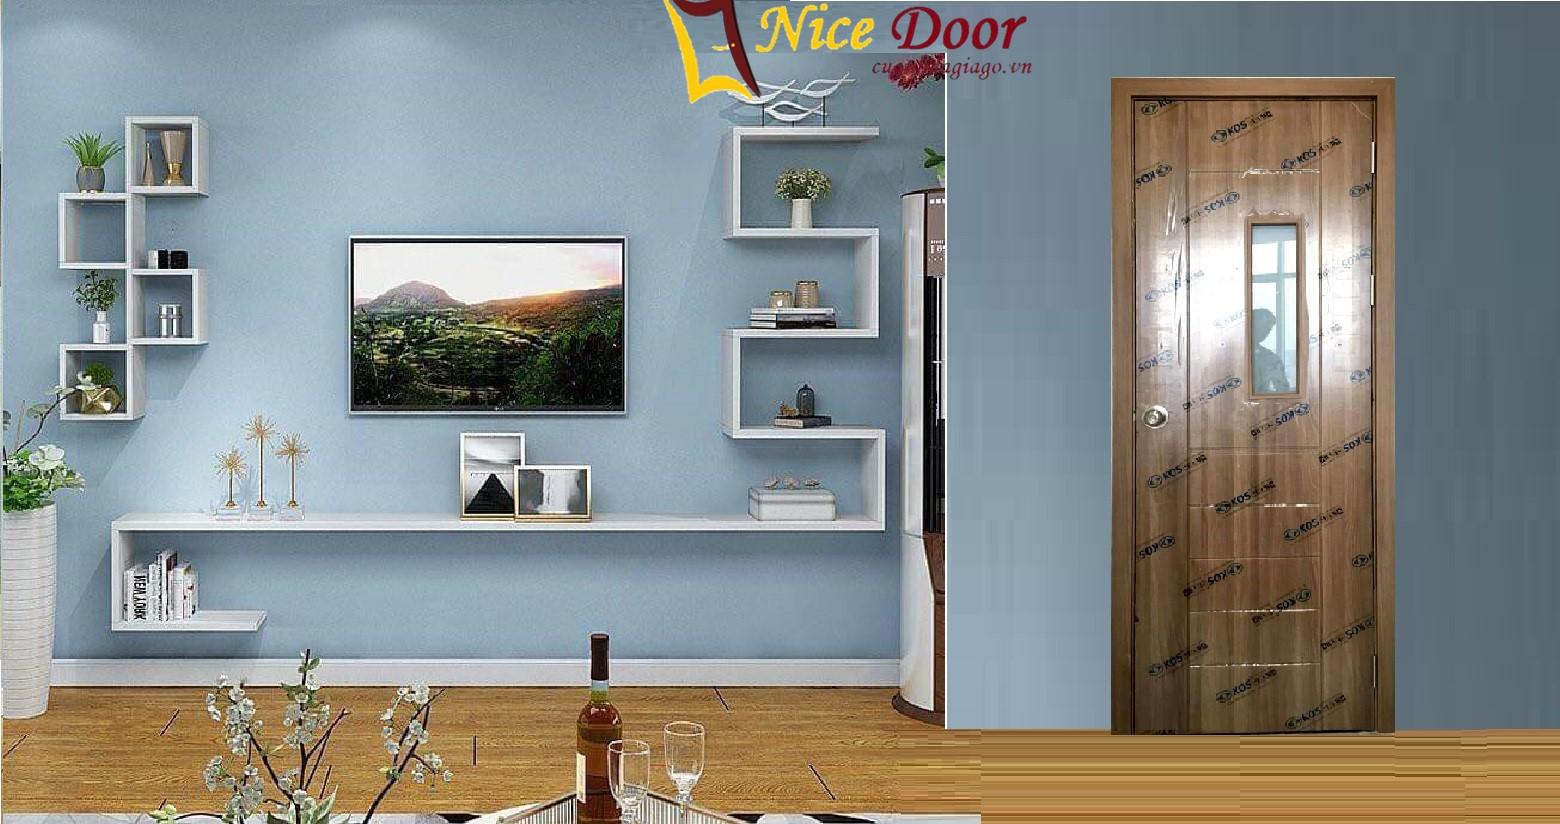 mẫu cửa nhựa gỗ giá rẻ